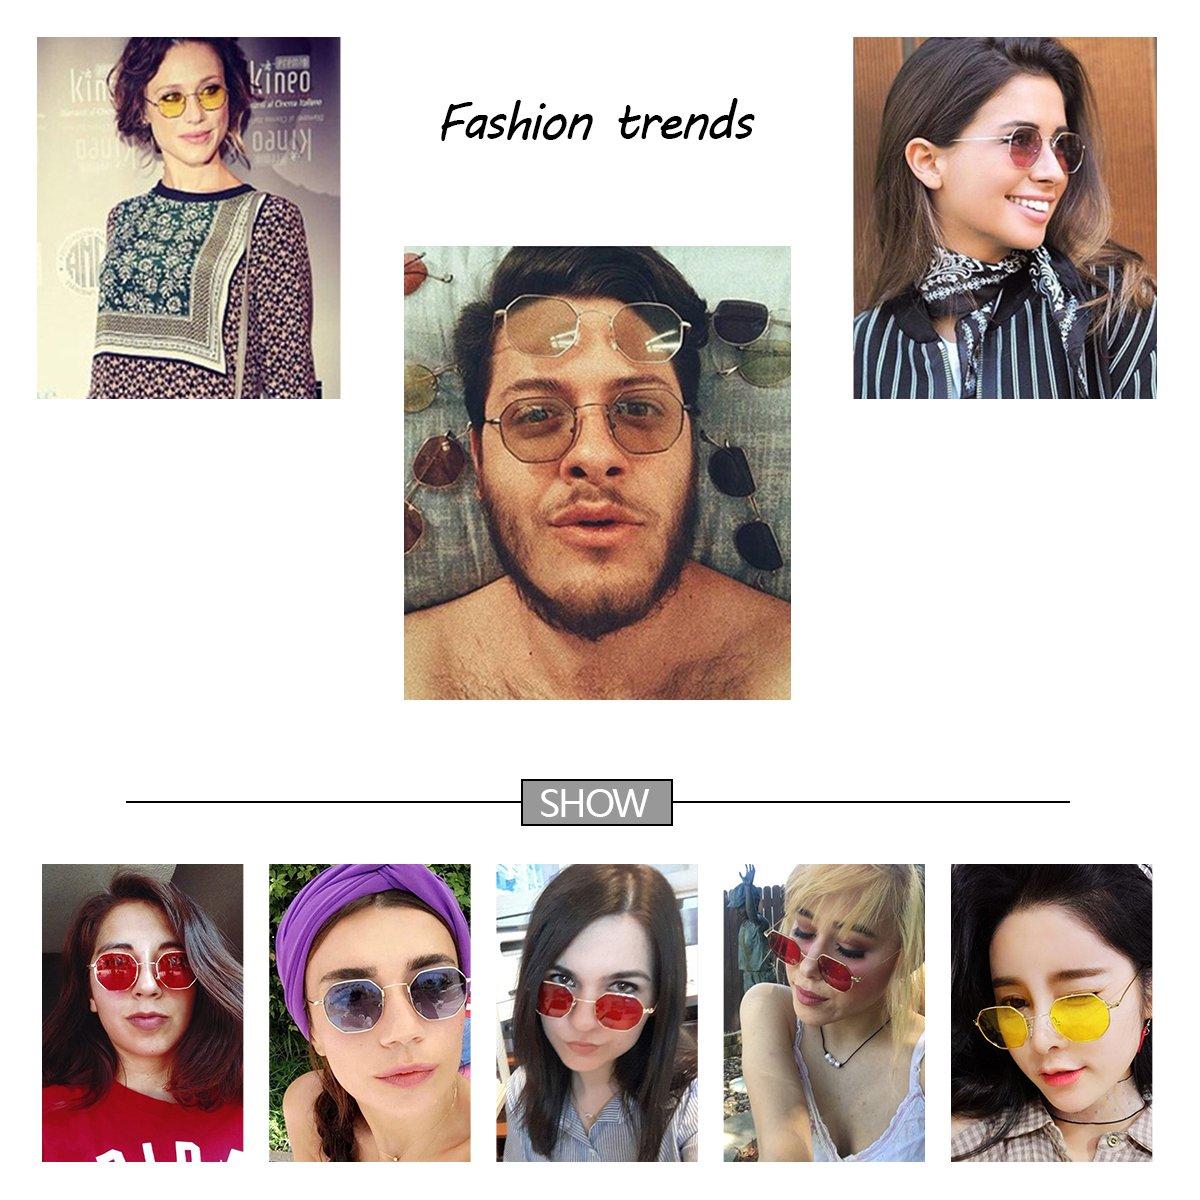 Sunglasses for women RAYSUN Small Metal Frame Asymmetry Temple Unisex Square Oval Non-polarized Sun Glasses